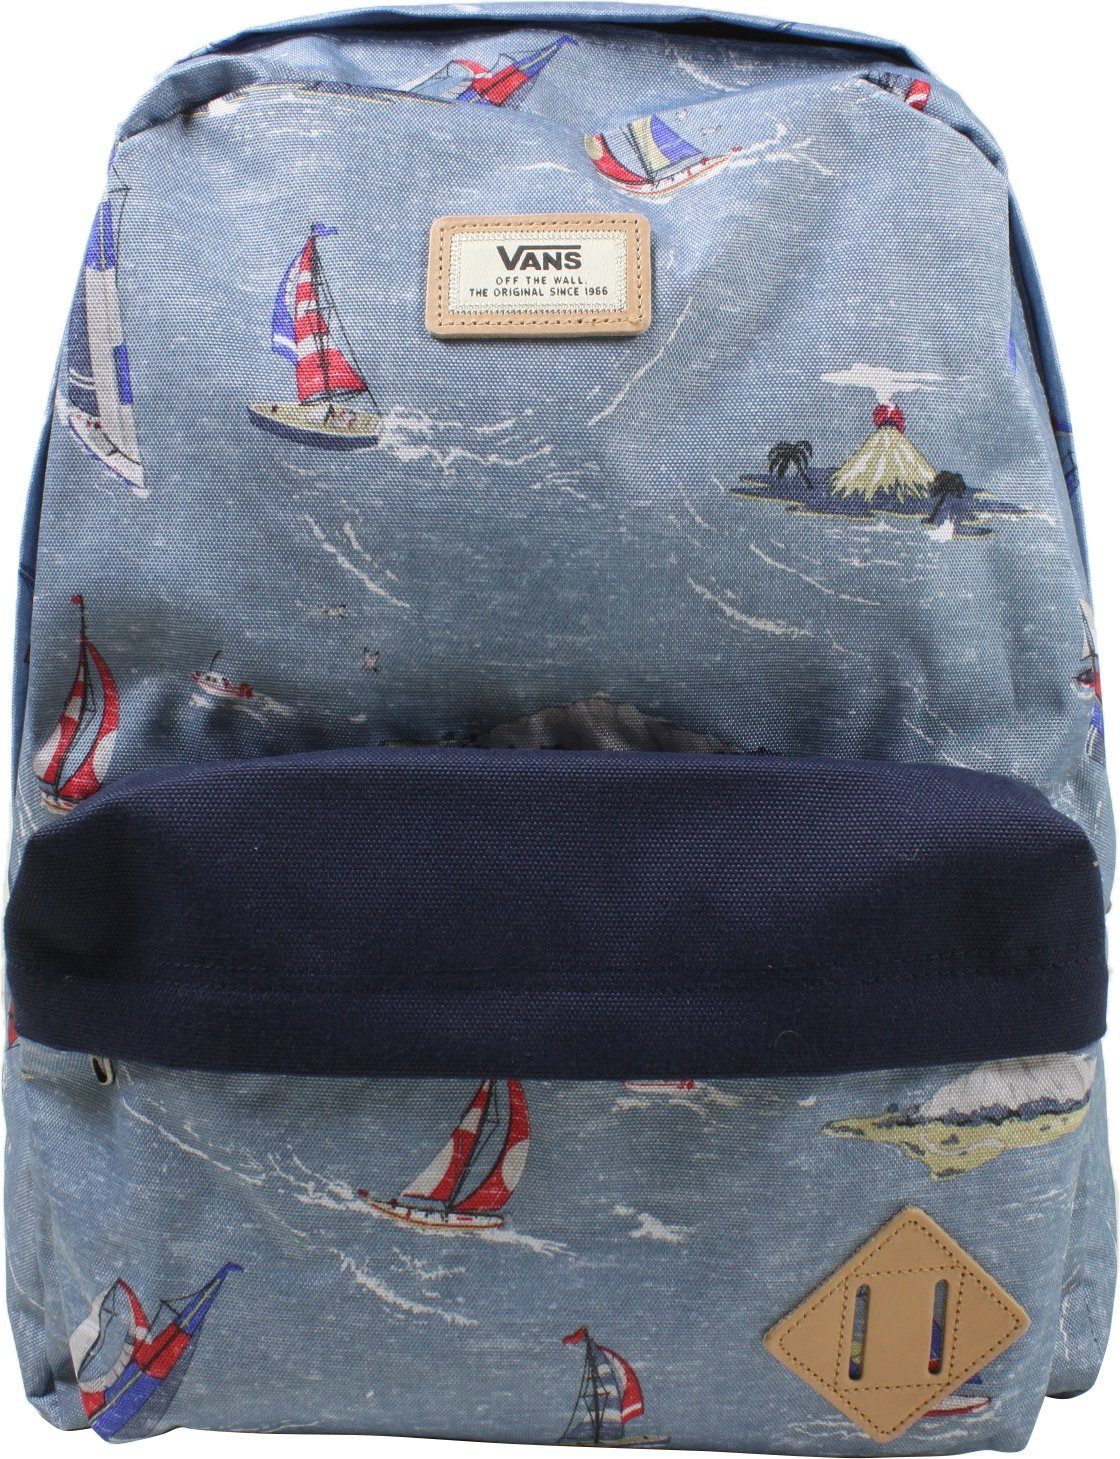 b6bfb72a993 Cheap Old Skool Backpack, find Old Skool Backpack deals on line at ...